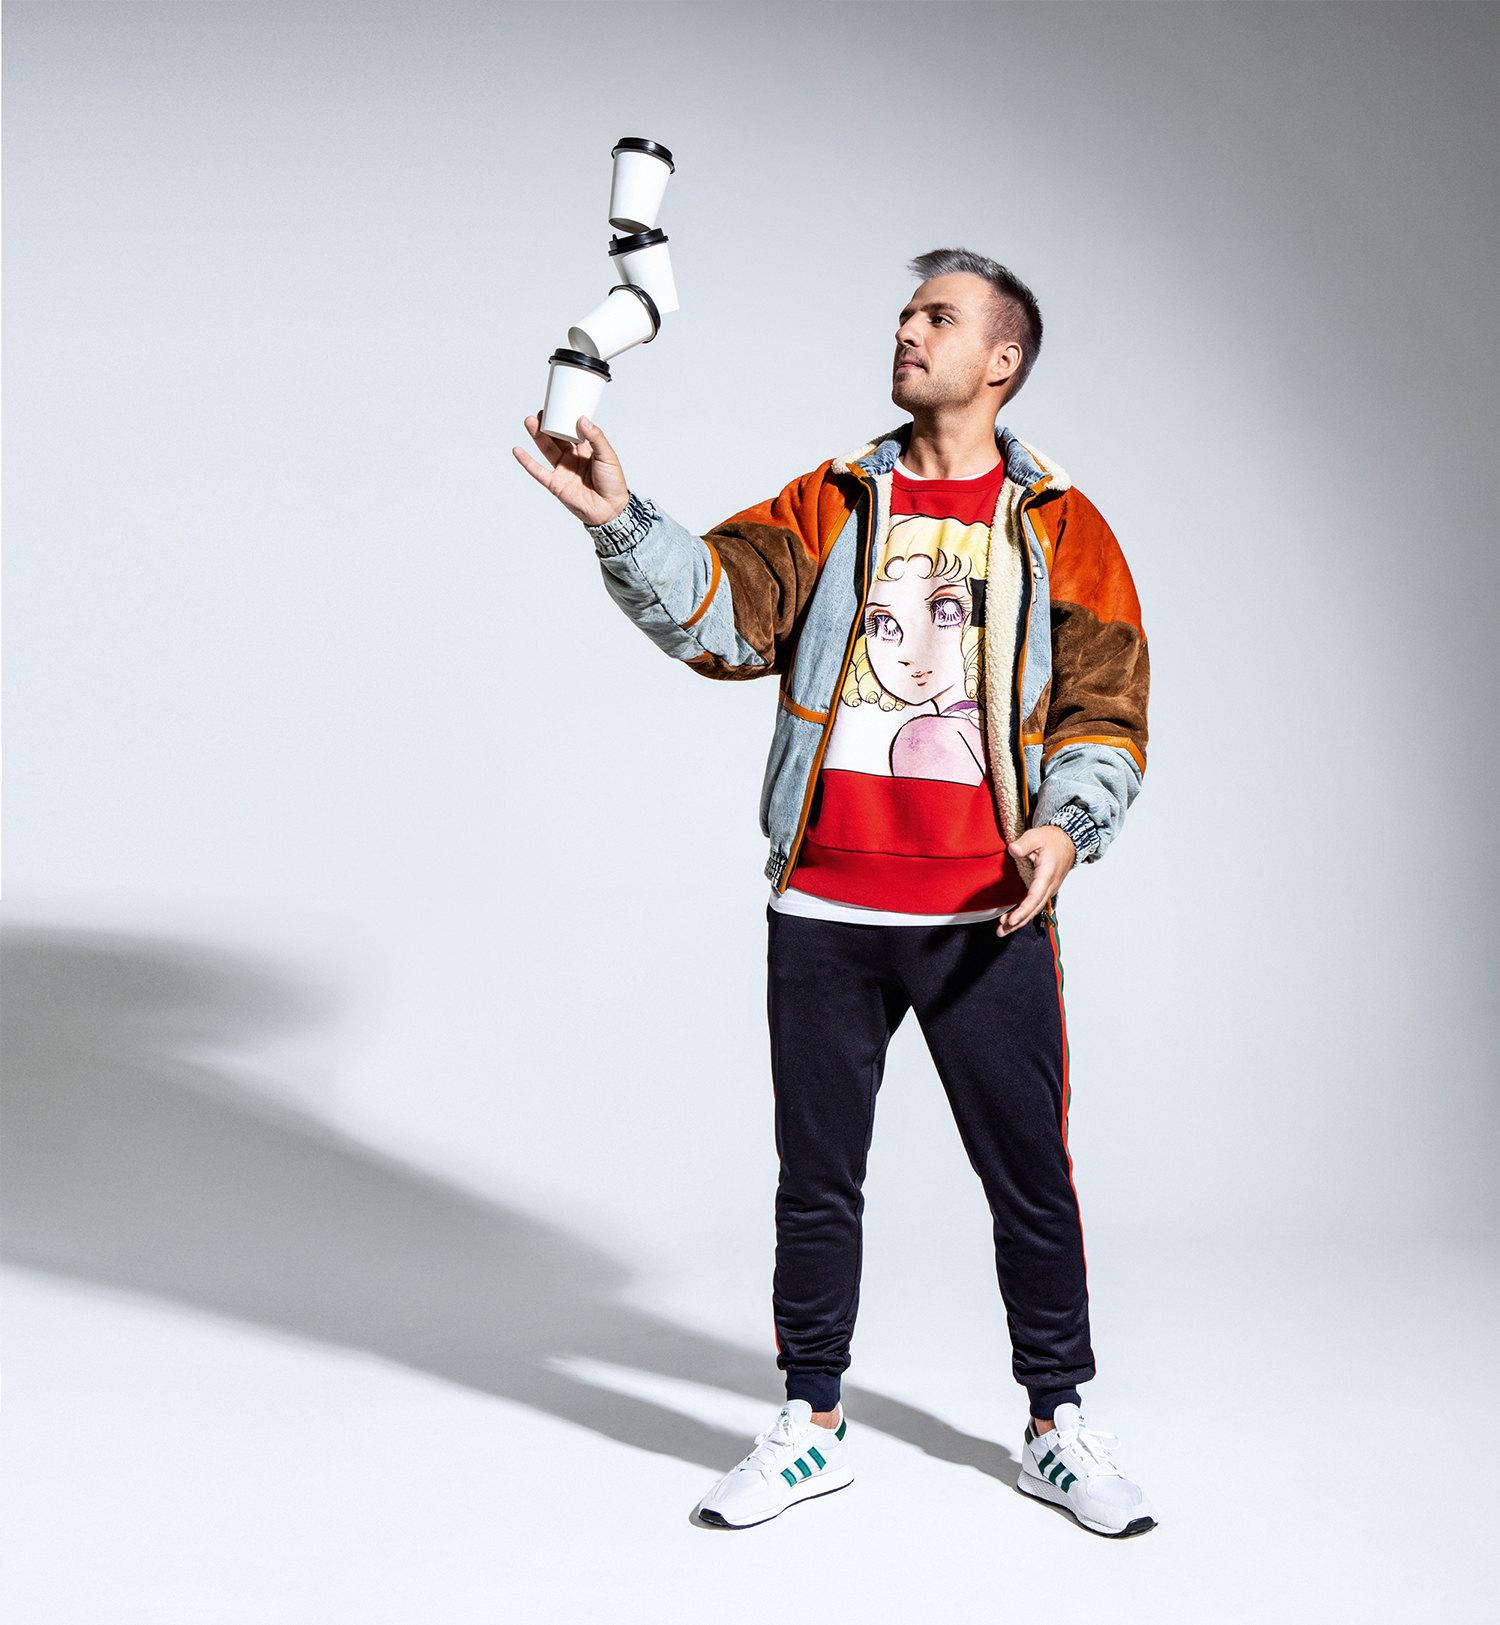 Бомбер, свитшот испортивные брюки, все Gucci; футболка Levi's; кроссовки adidas Originals